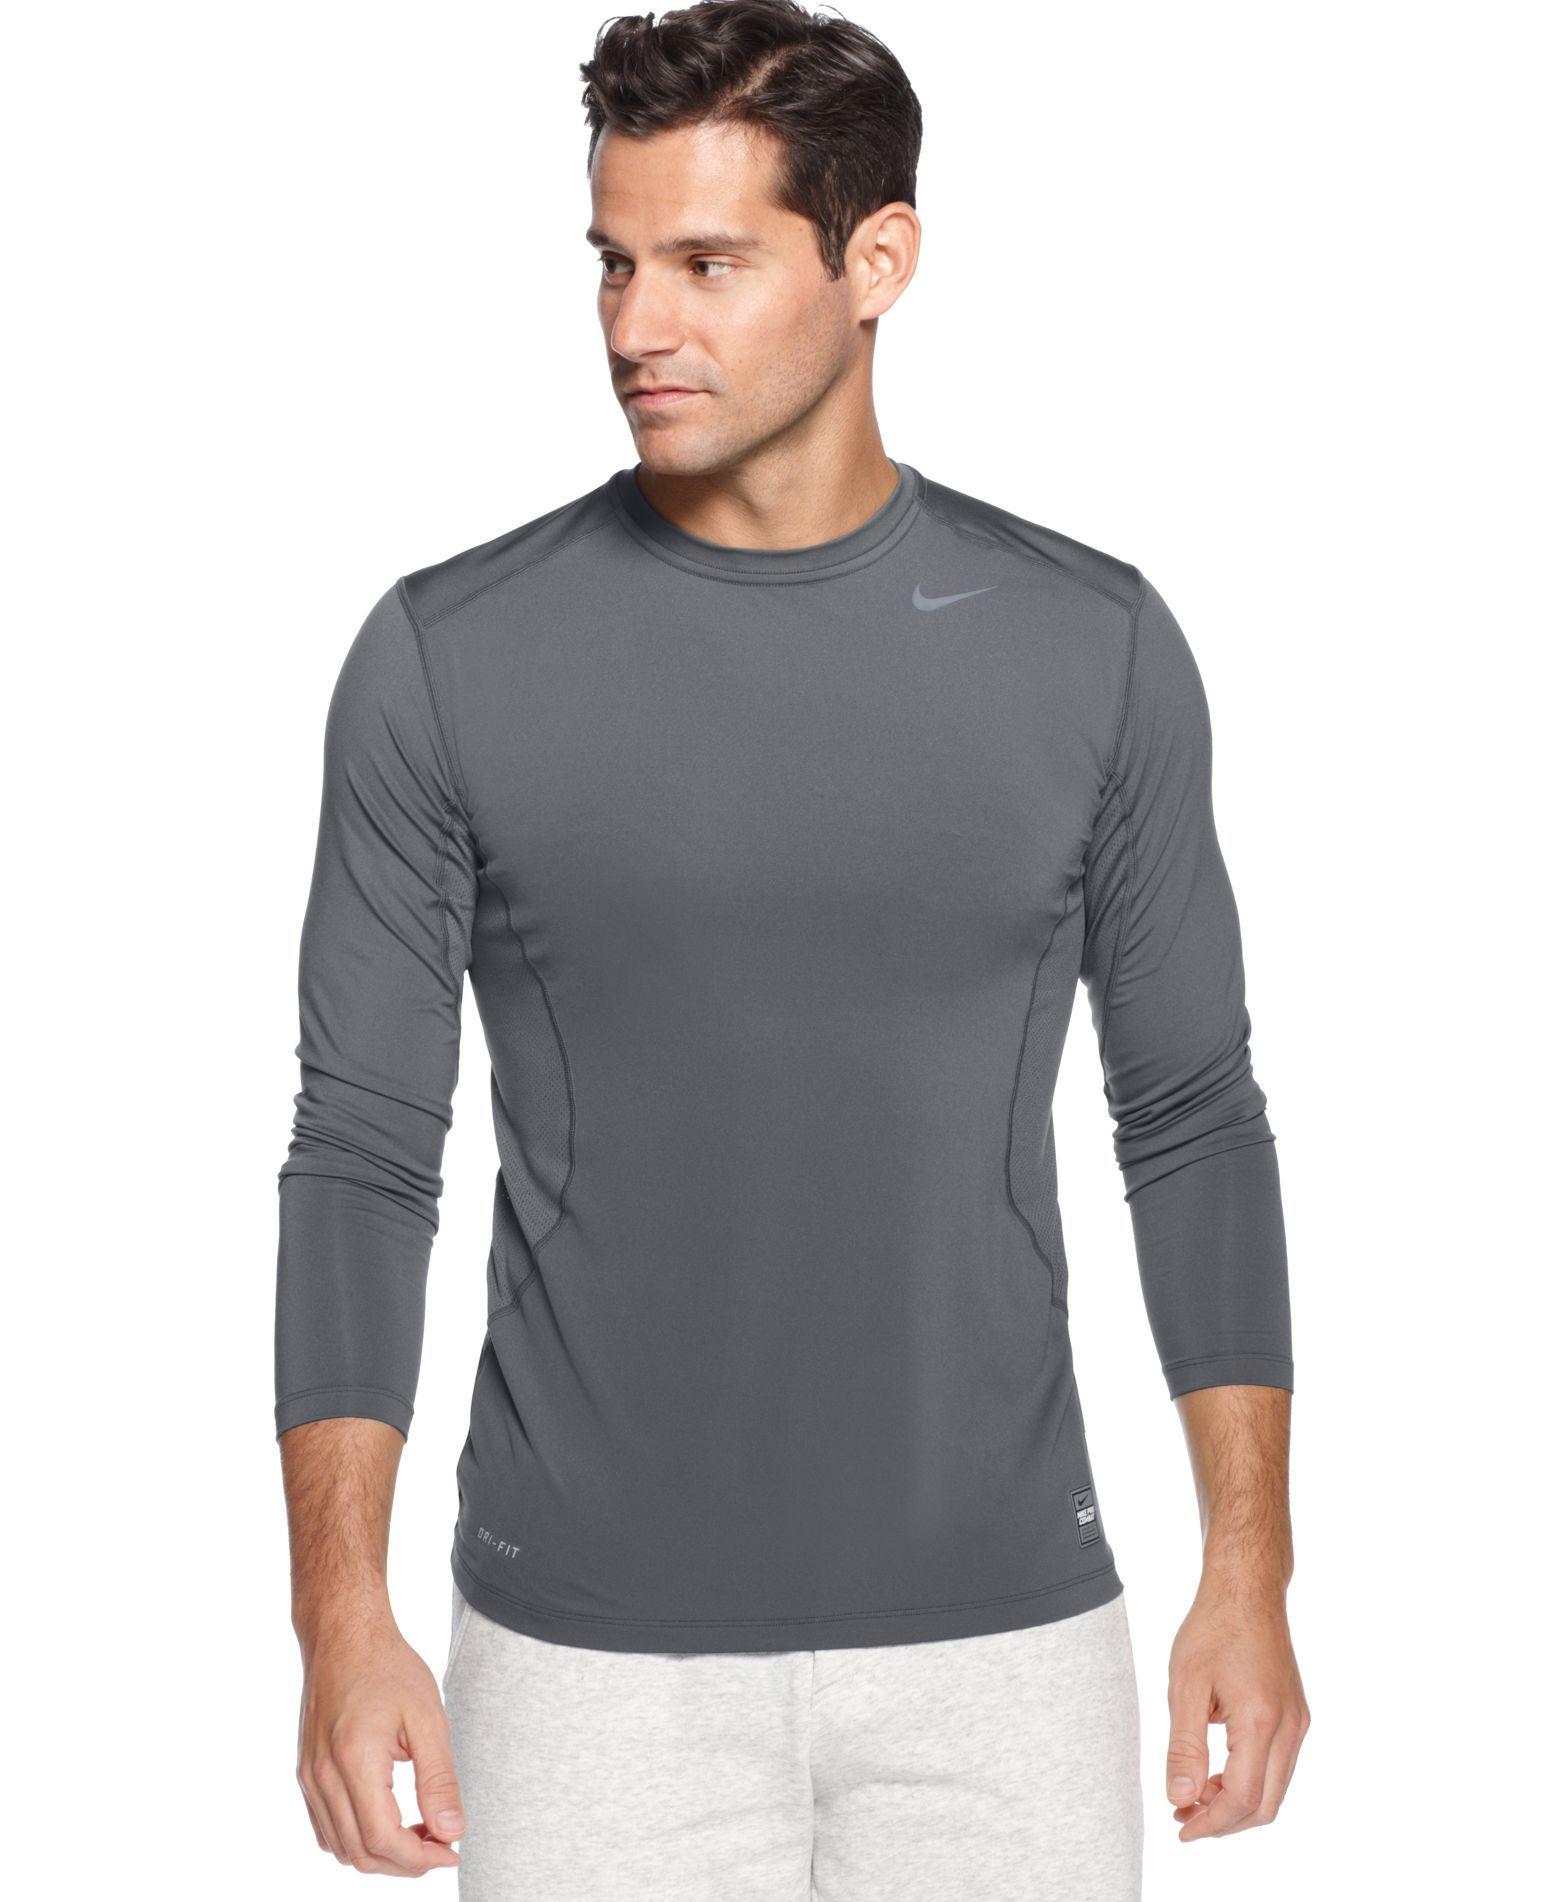 97fc70c3222 Nike T-Shirt